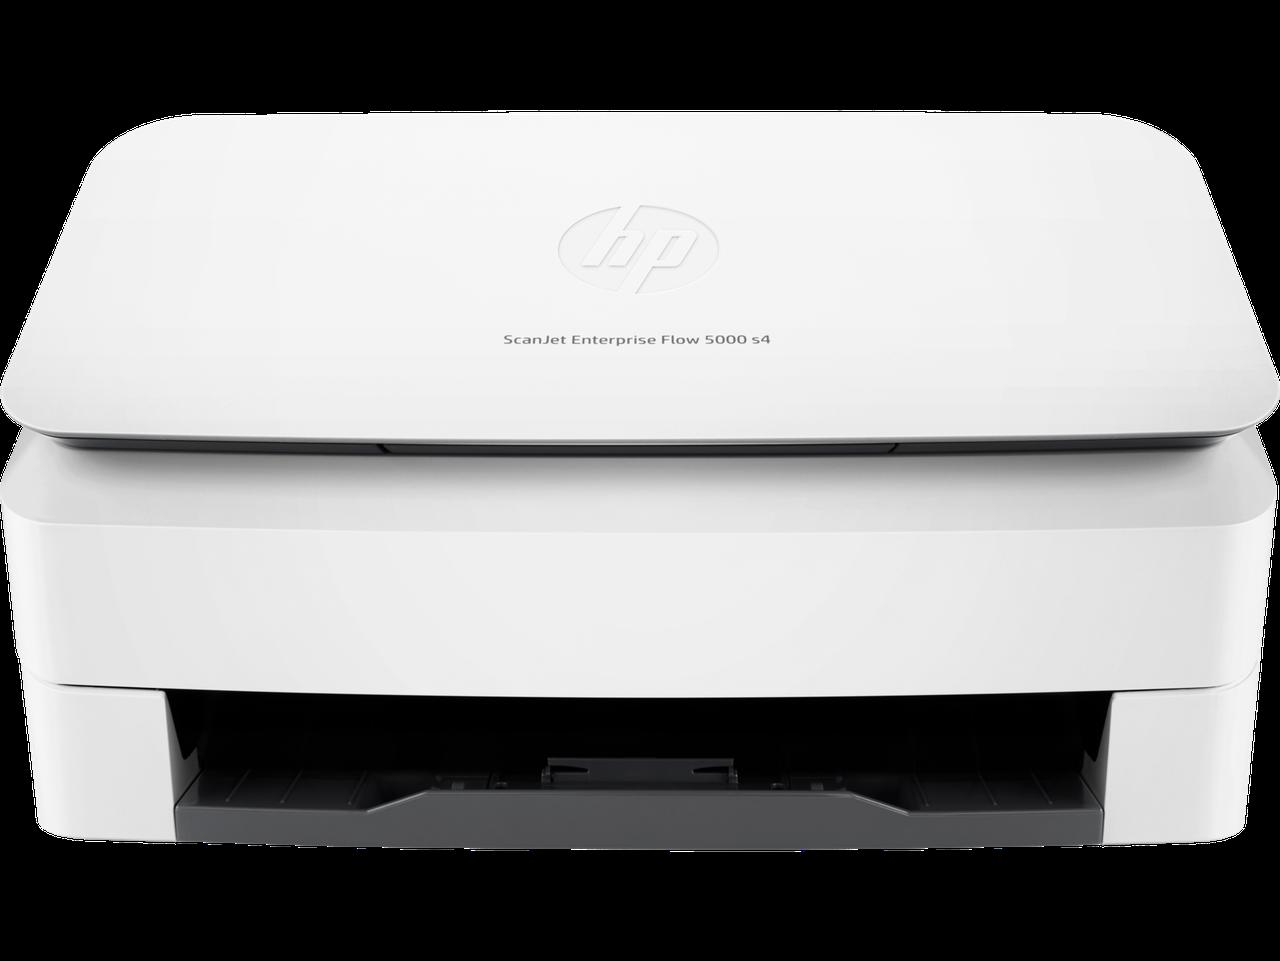 СканерHP L2755A HP ScanJet Ent Flw 5000 S4 Sheet-Feed Scnr (A4) , 600 dpi, 50ppm/100ipm, 1 pass duplex, shee